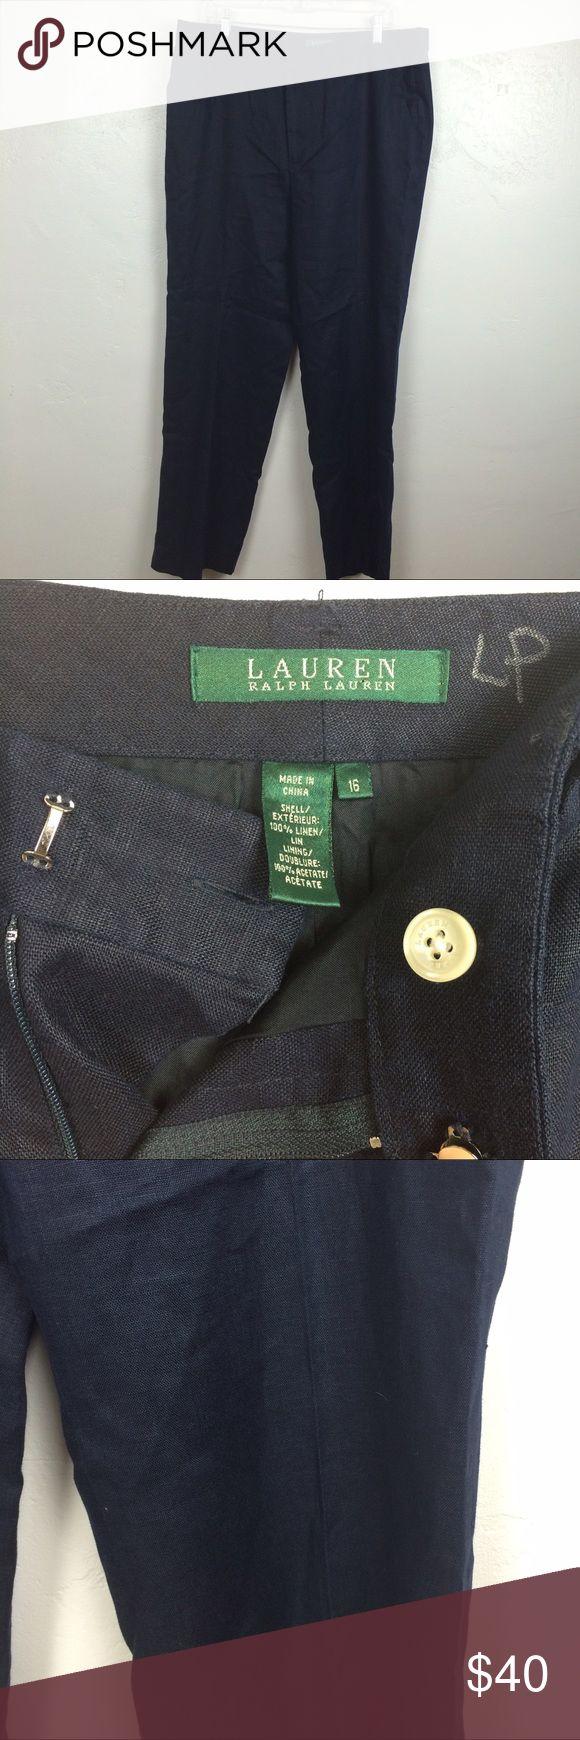 Ralph Lauren navy blue women's career pants linen Perfect condition Ralph Lauren pants that can be a summer option to a work outfit. Looks very professional but comfortable too ! Ralph Lauren Pants Straight Leg